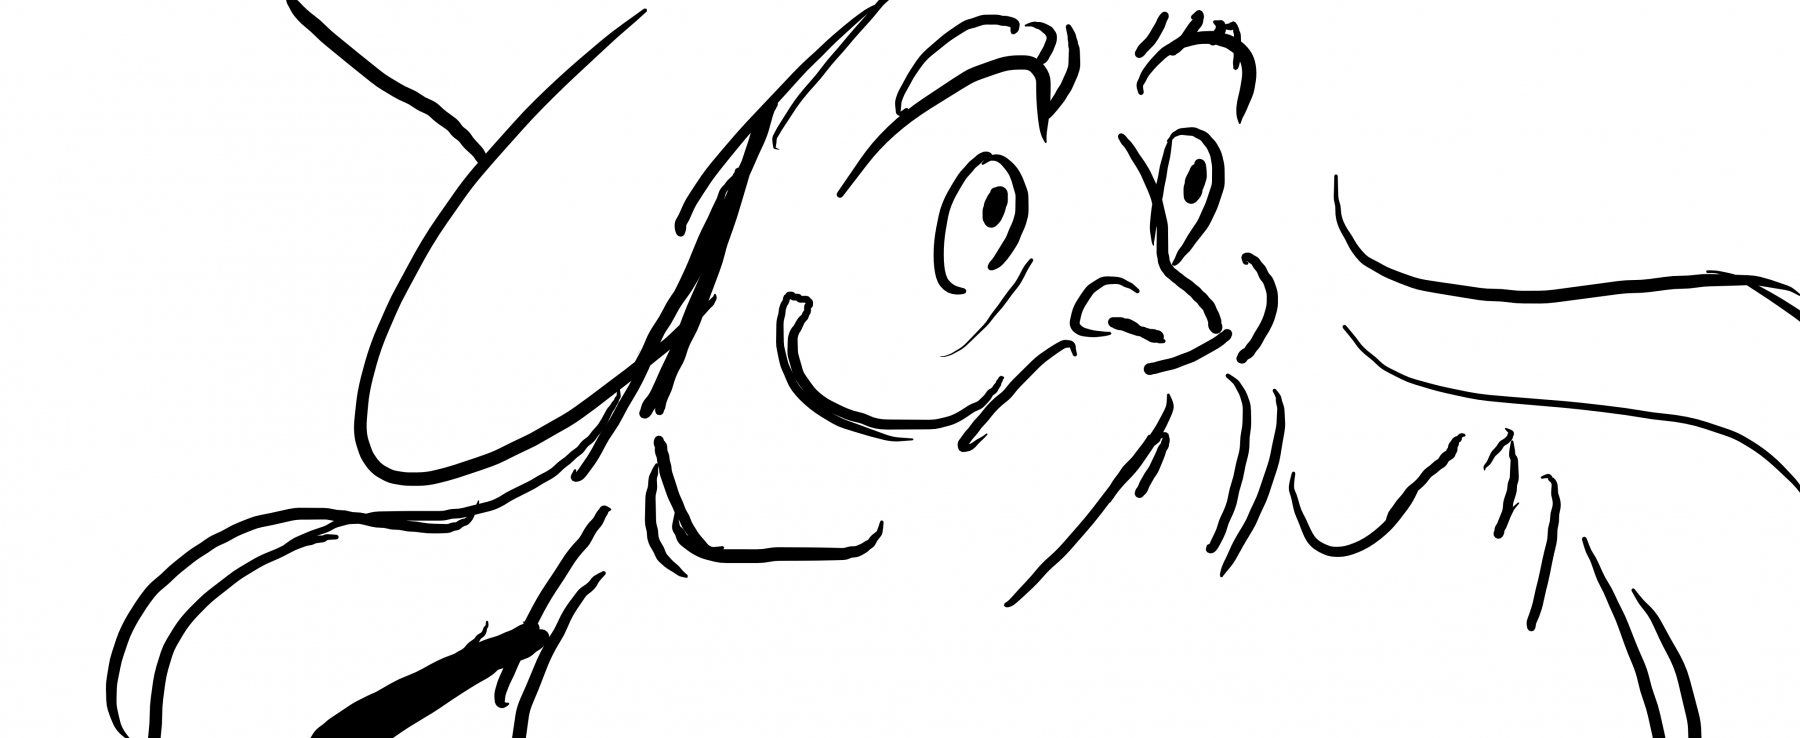 Nut-Thumbnail-Rough-Board00333